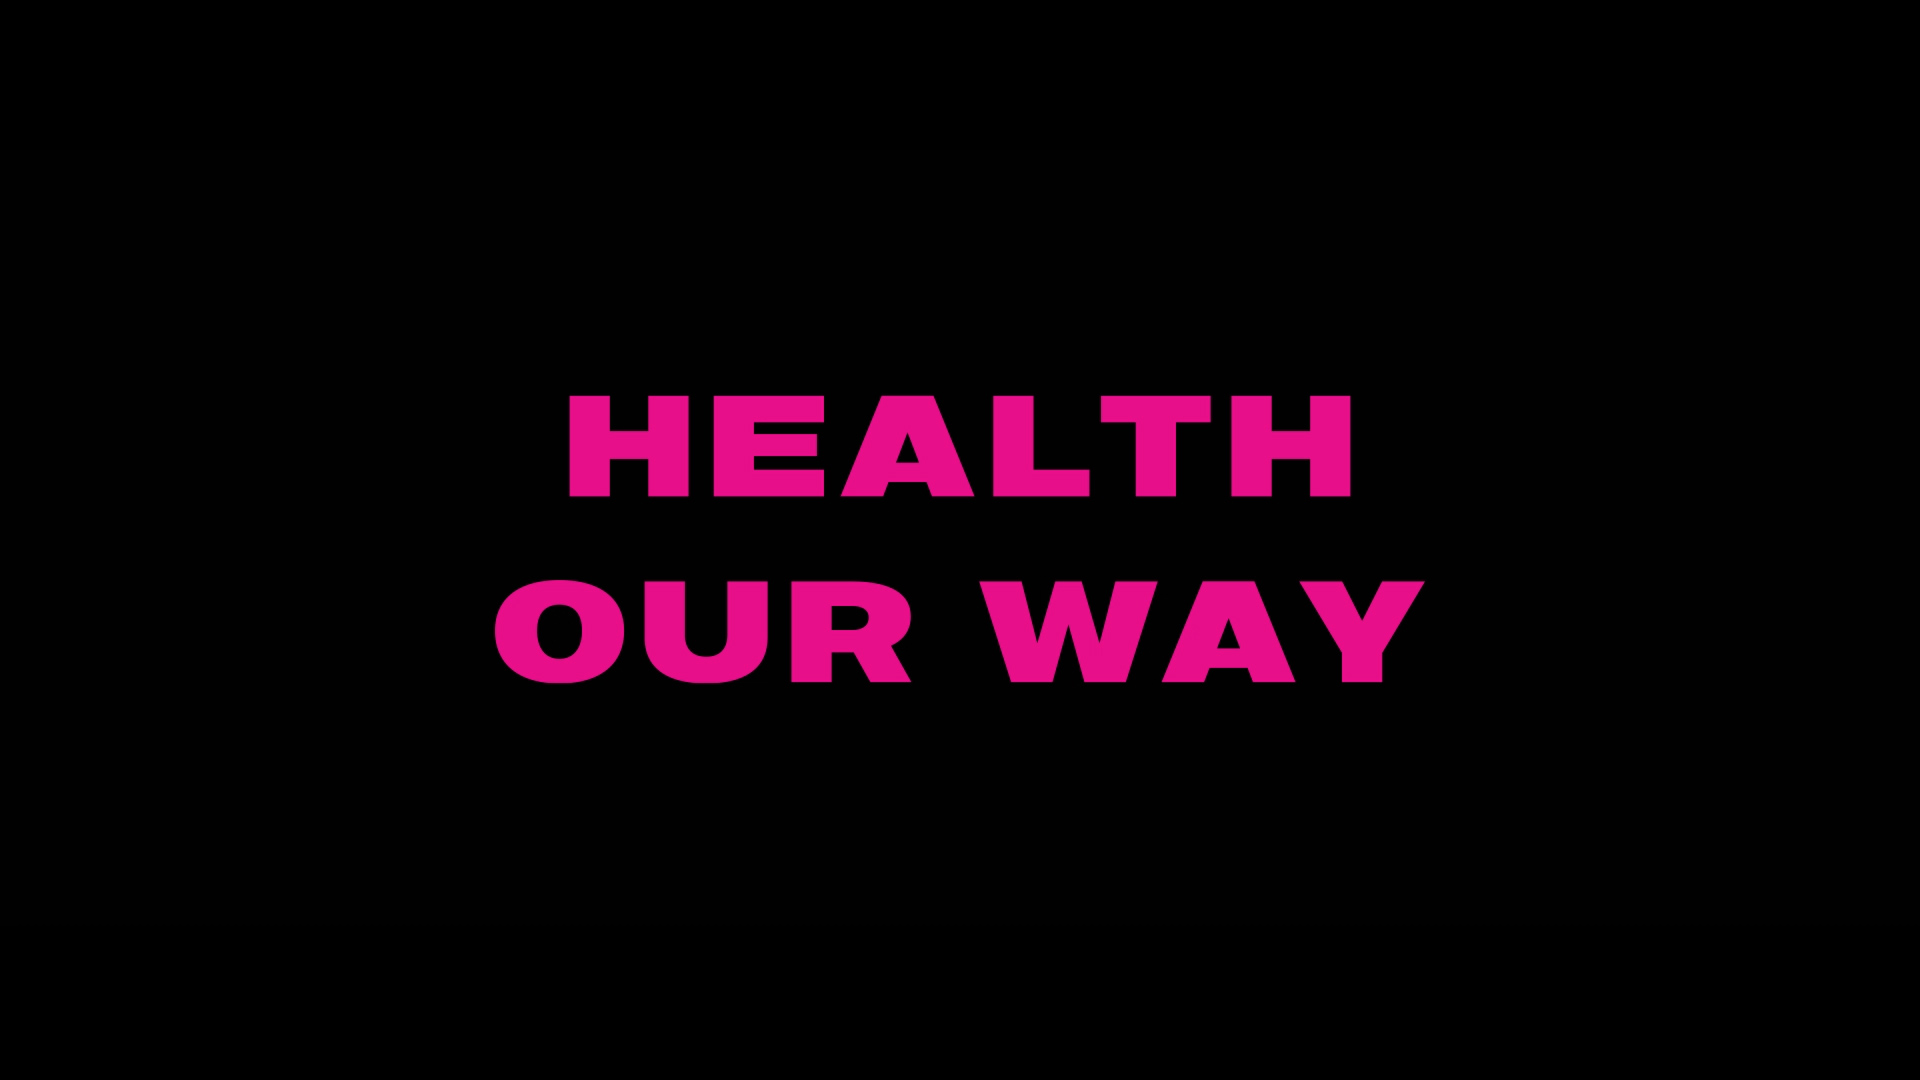 HEALTH OUR WAY.00_00_59_16.Still027.jpg